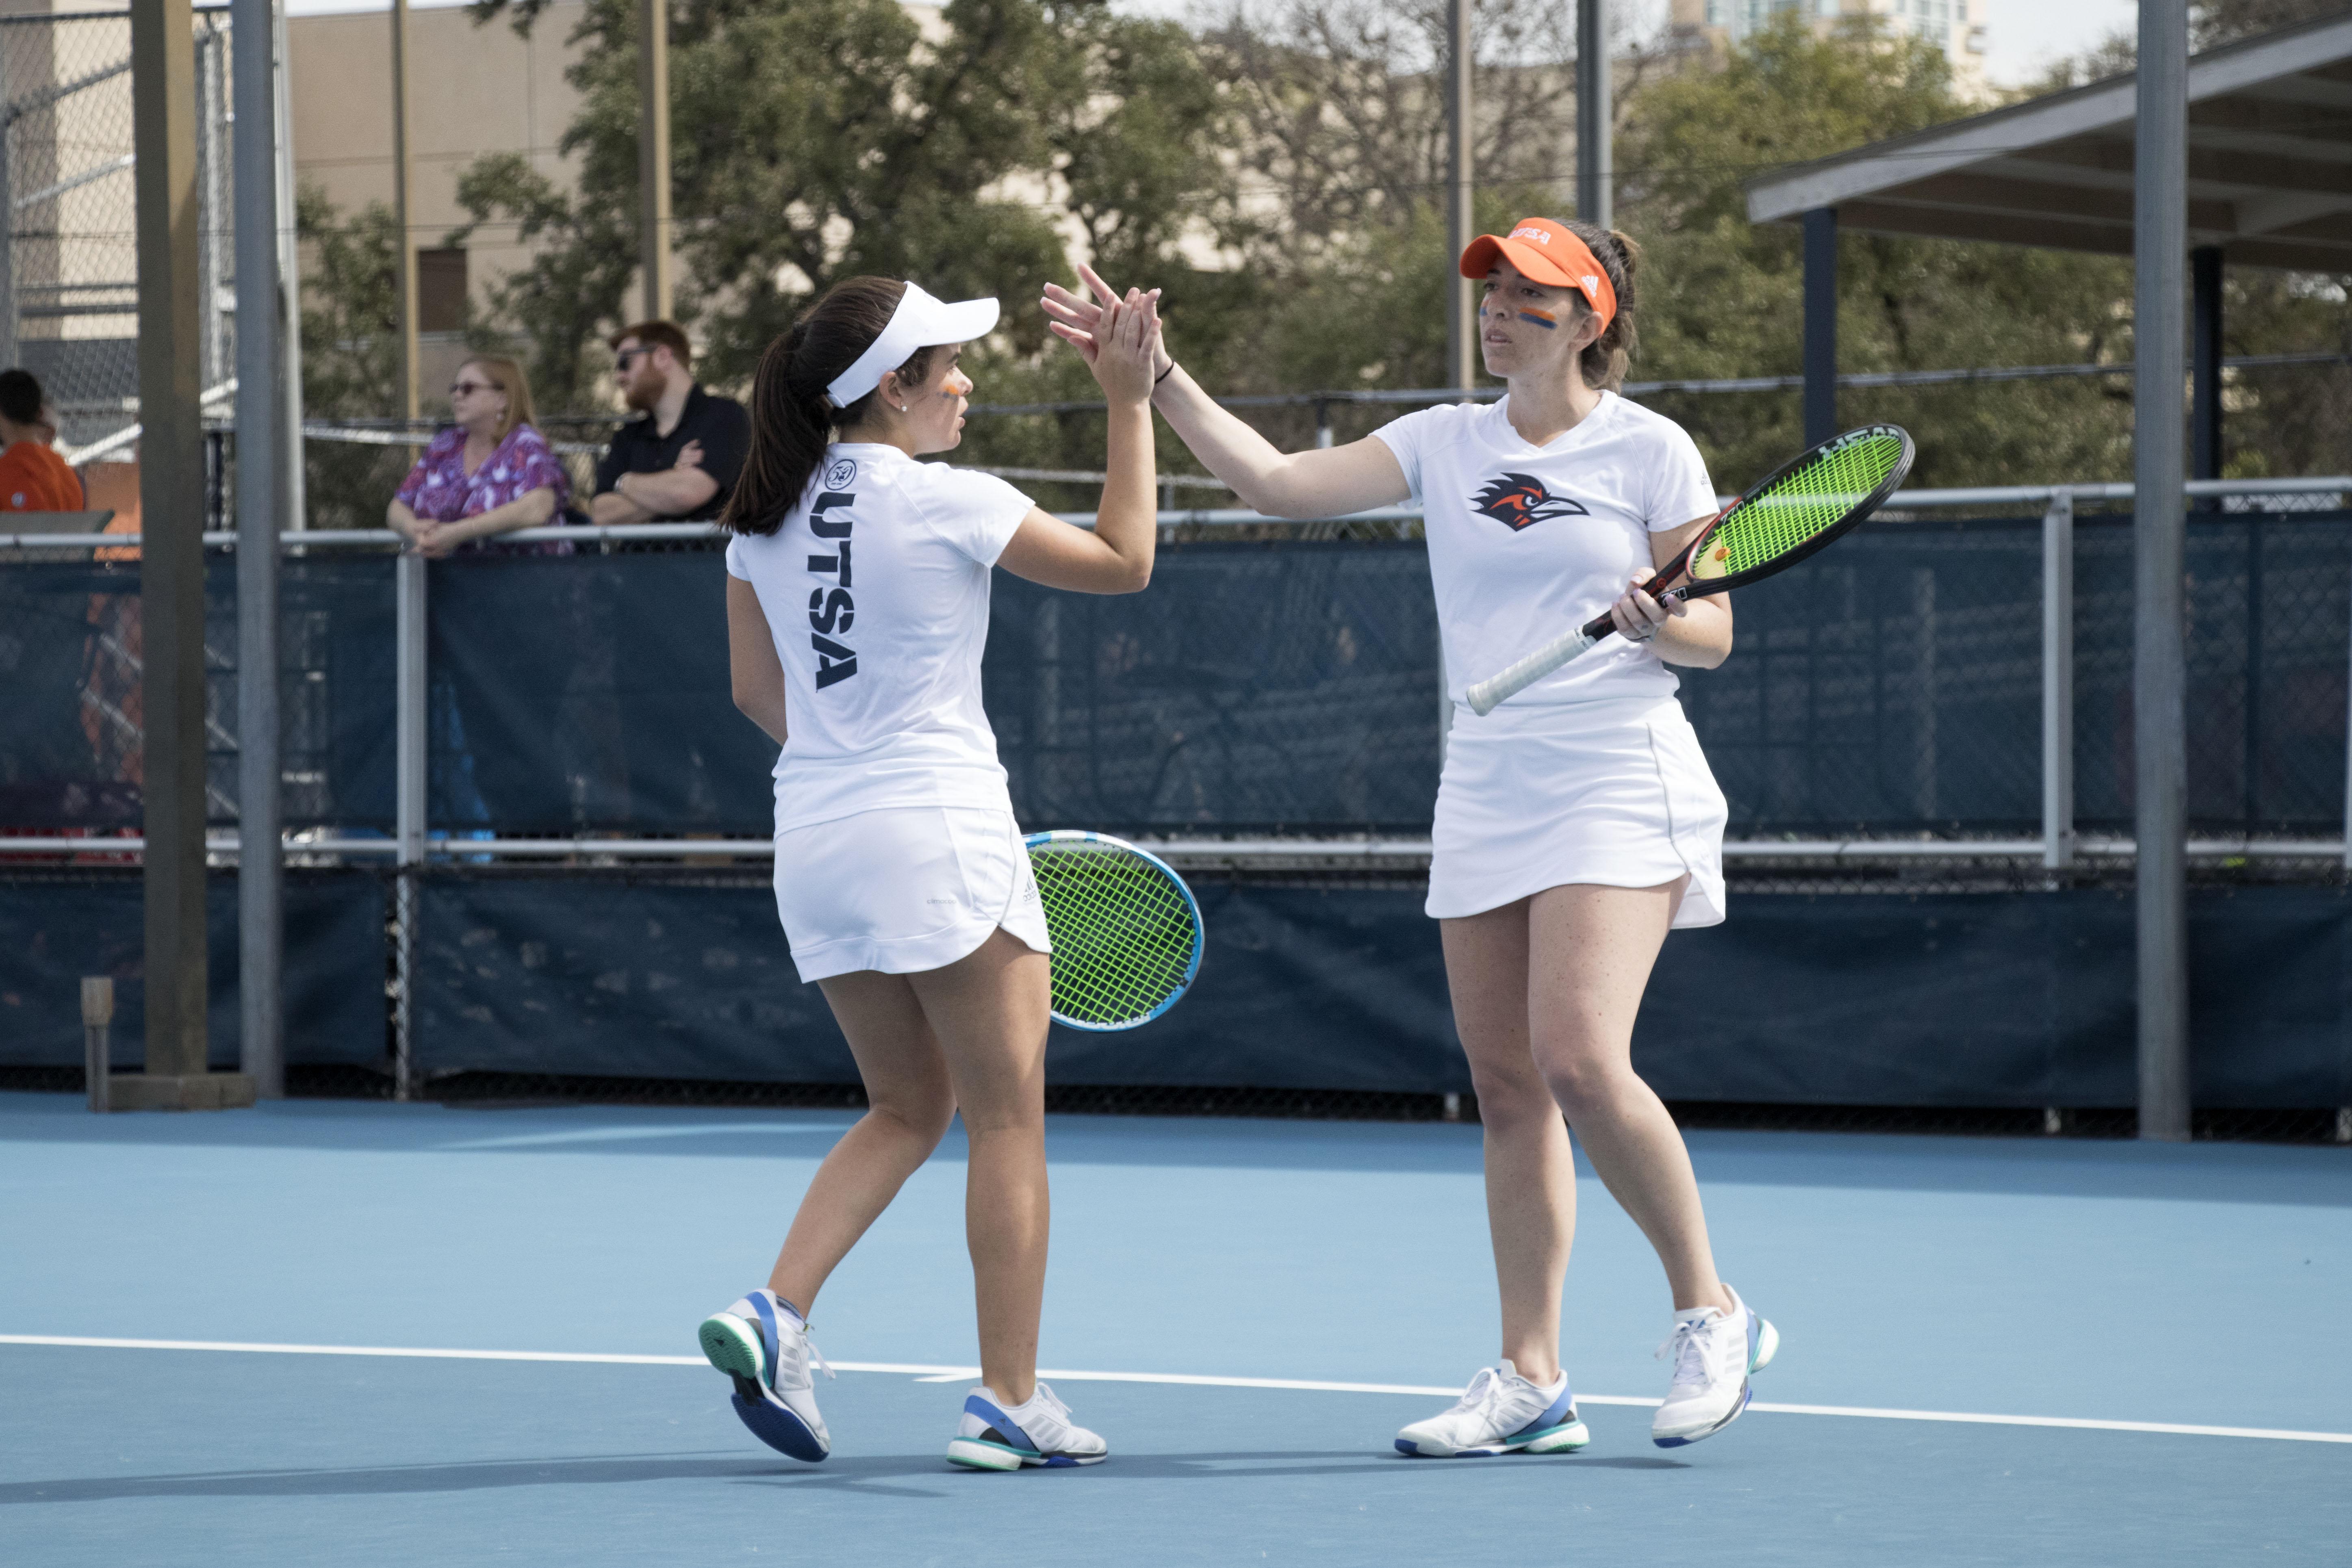 Mariah Plauth high-fives her teammate.